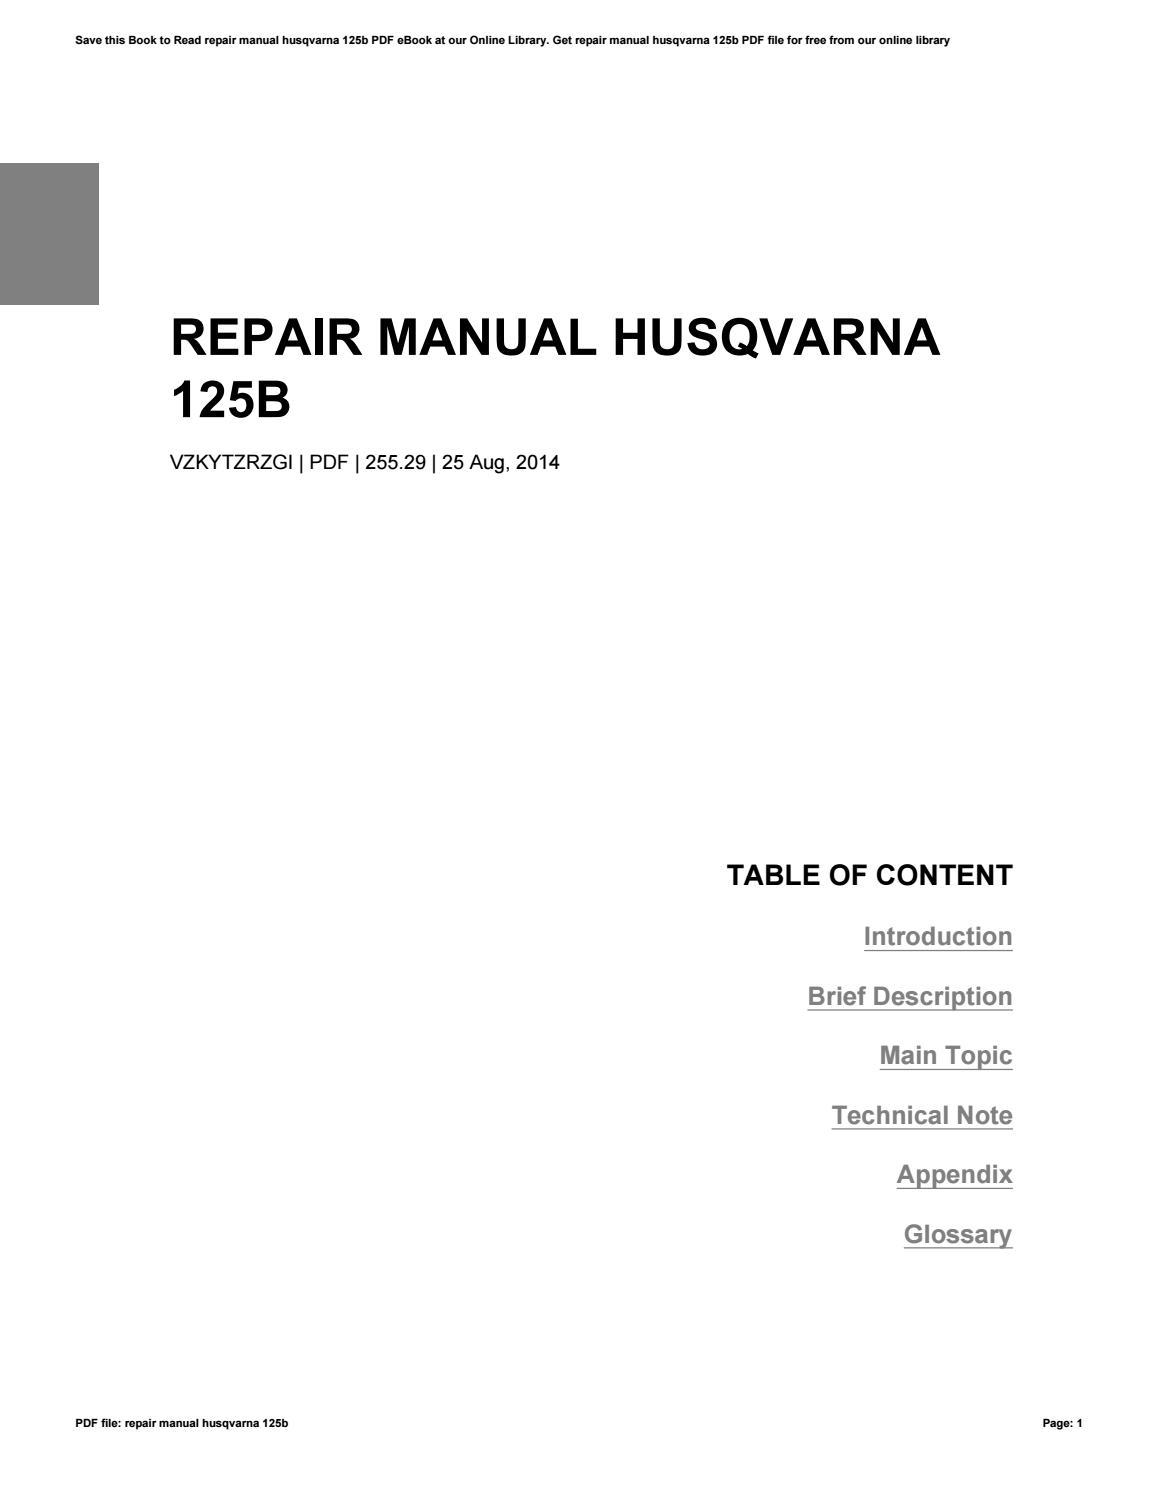 husqvarna wr125 cr125 full service repair manual 2006